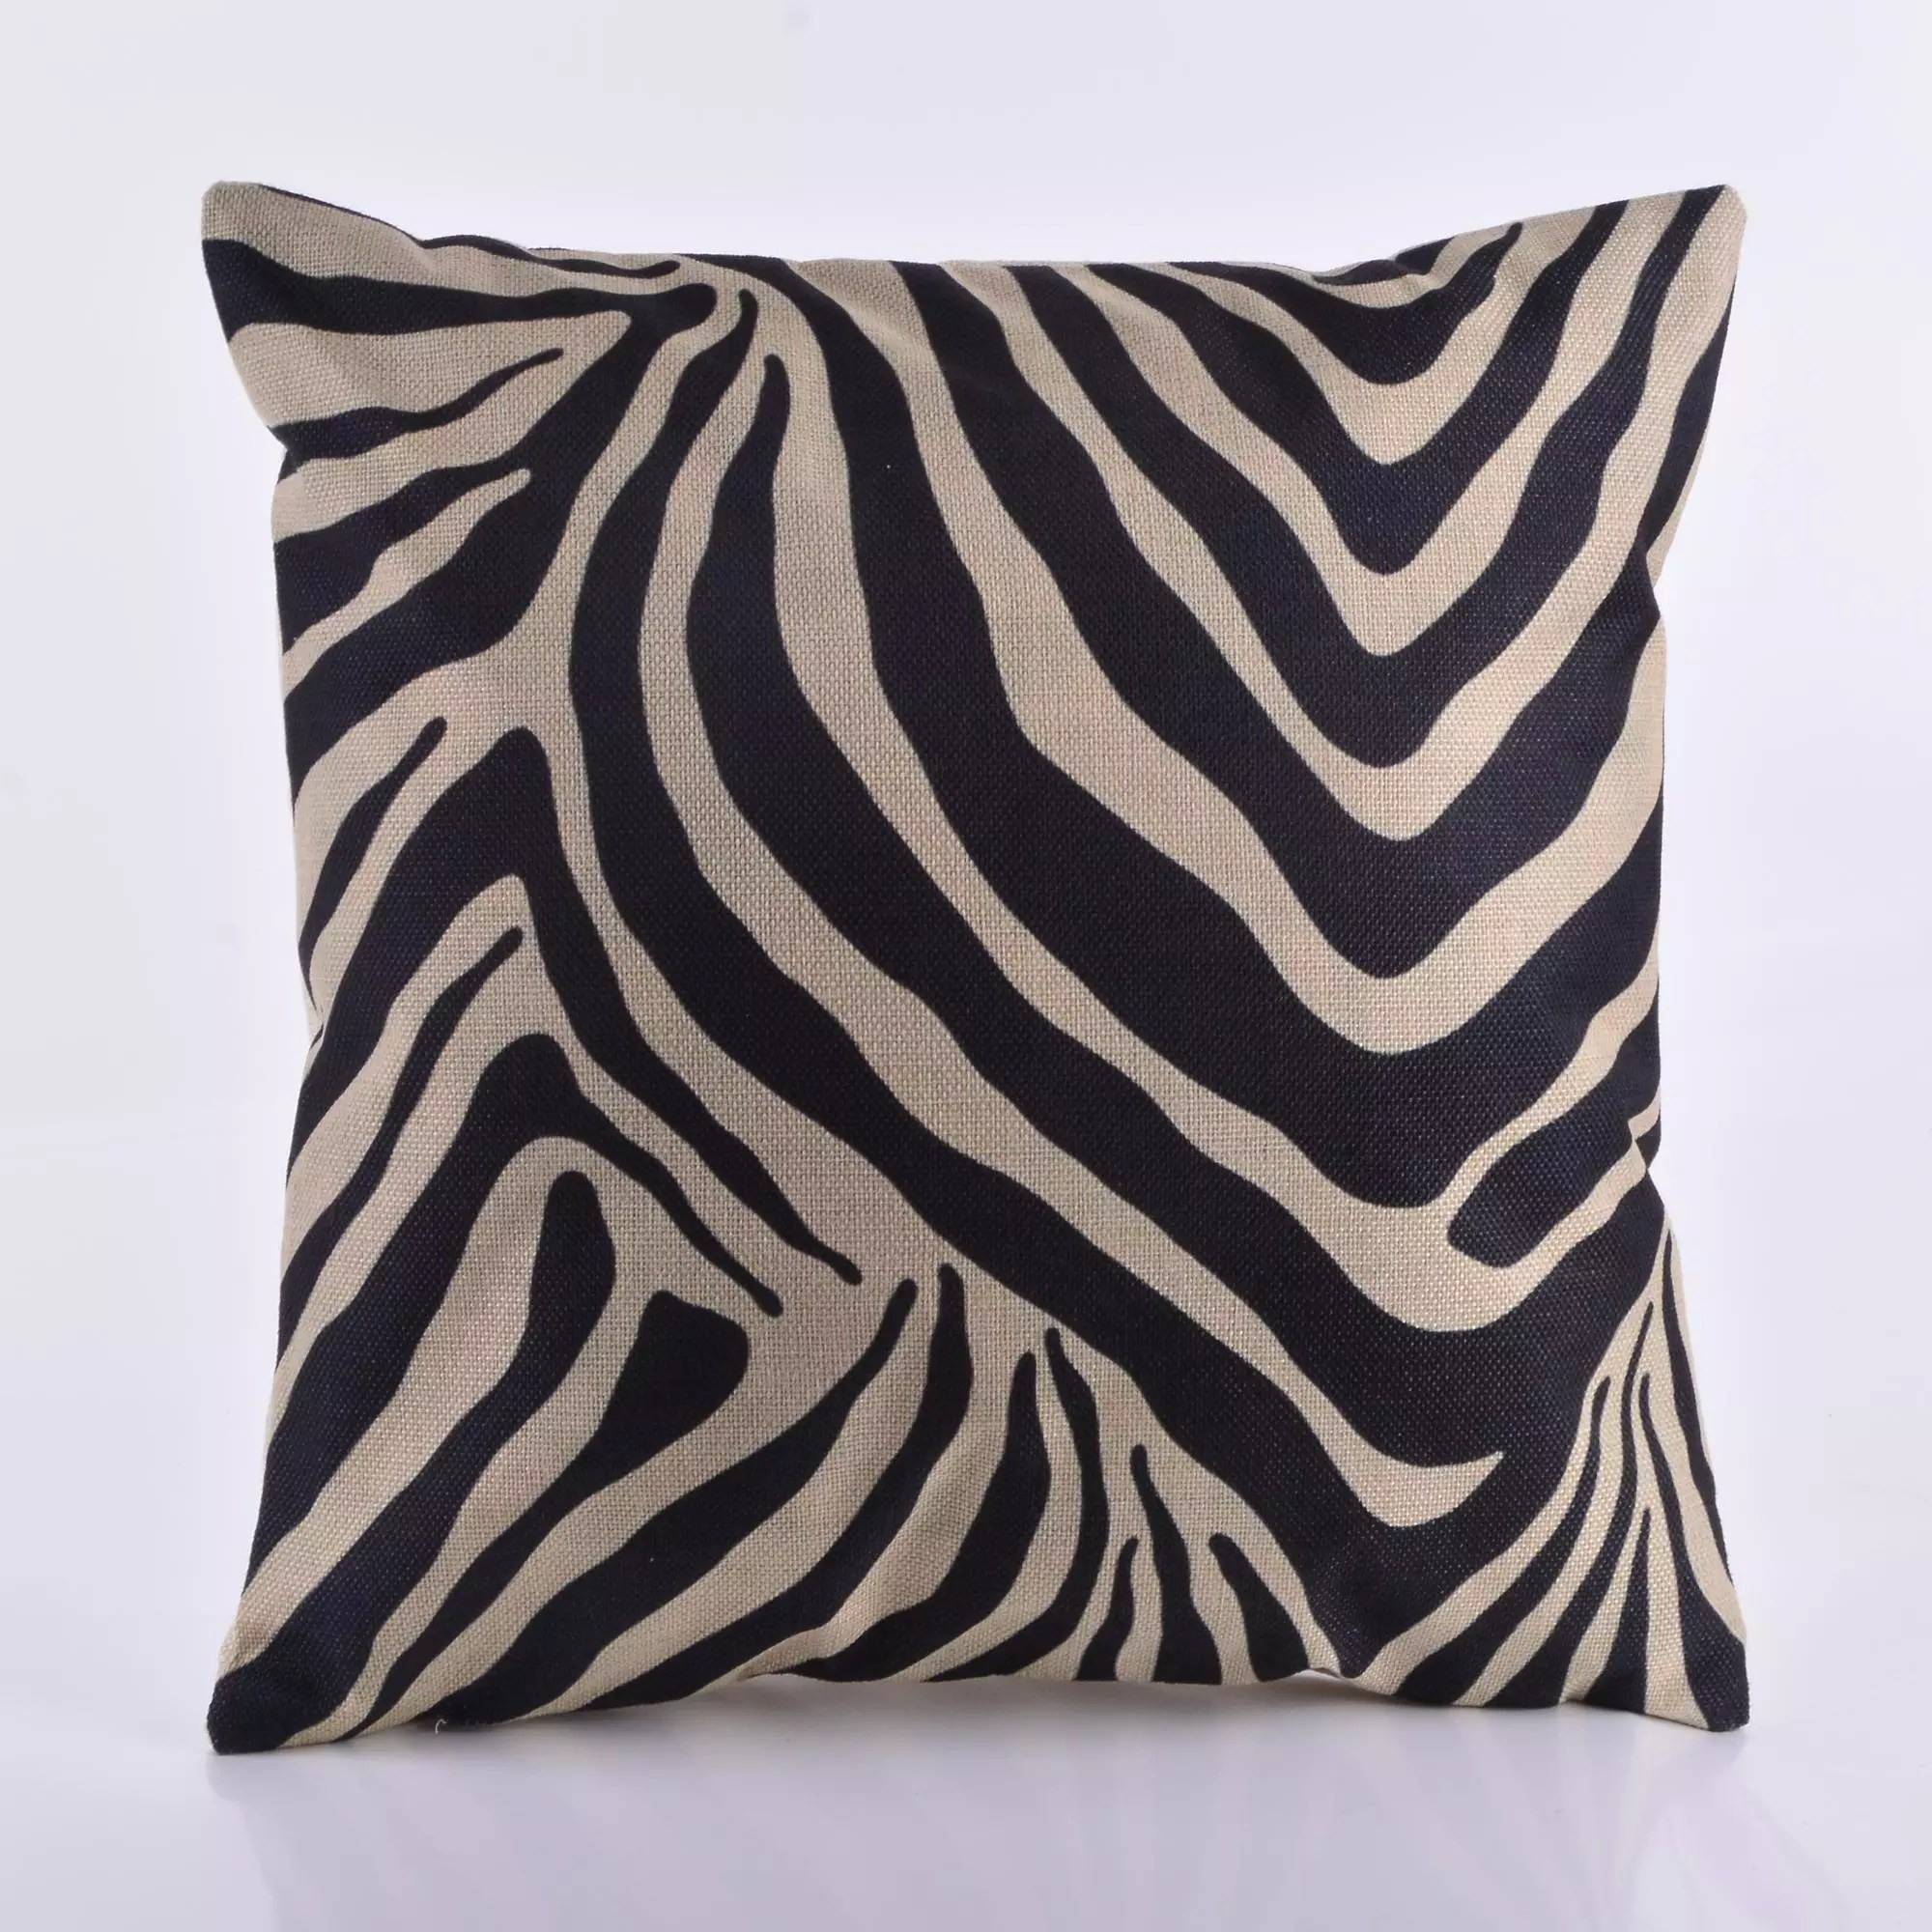 black and white zebra stripes pattern cousin cover fashion pillowcase for sofa polyester pillow cover buy pillow cover sofa pillow case cousin cover